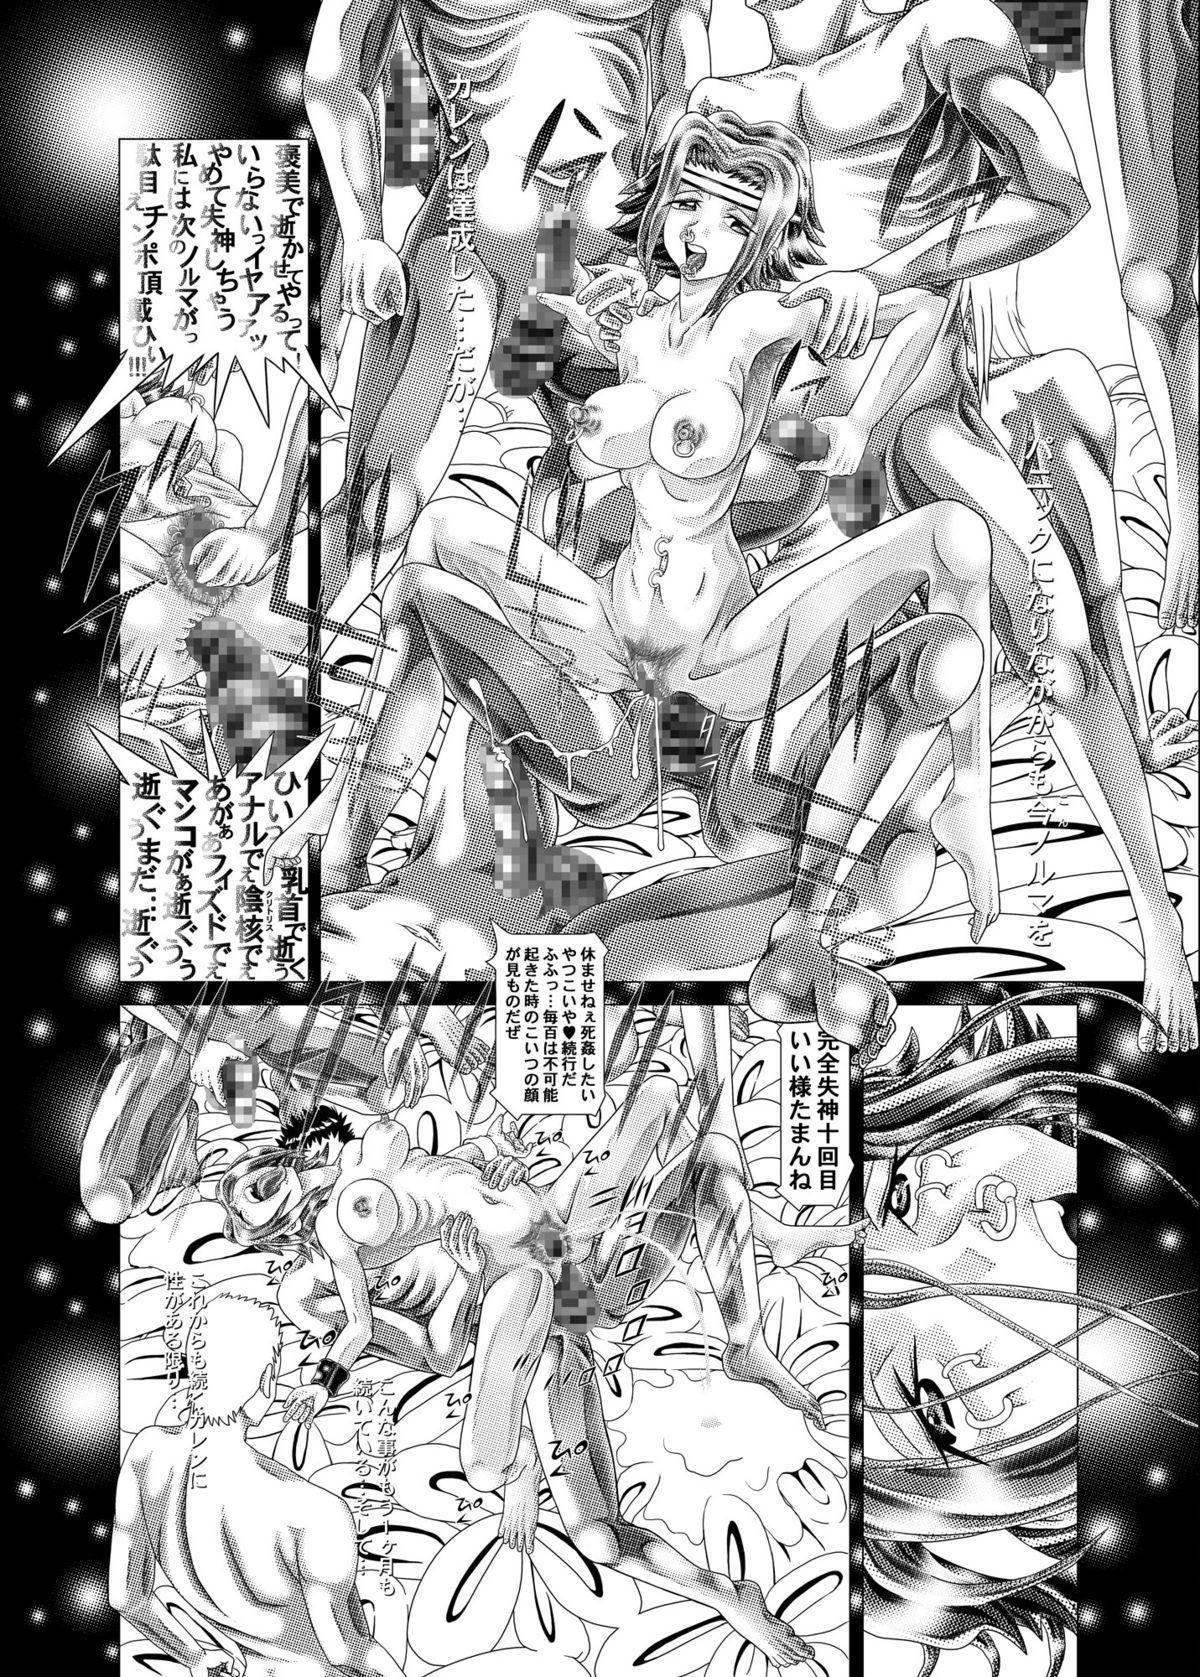 [Kaki no Boo (Kakinomoto Utamaro)] Karen - R22 of the Cord Eros - Infringement (Code Geass) [Digital] 13